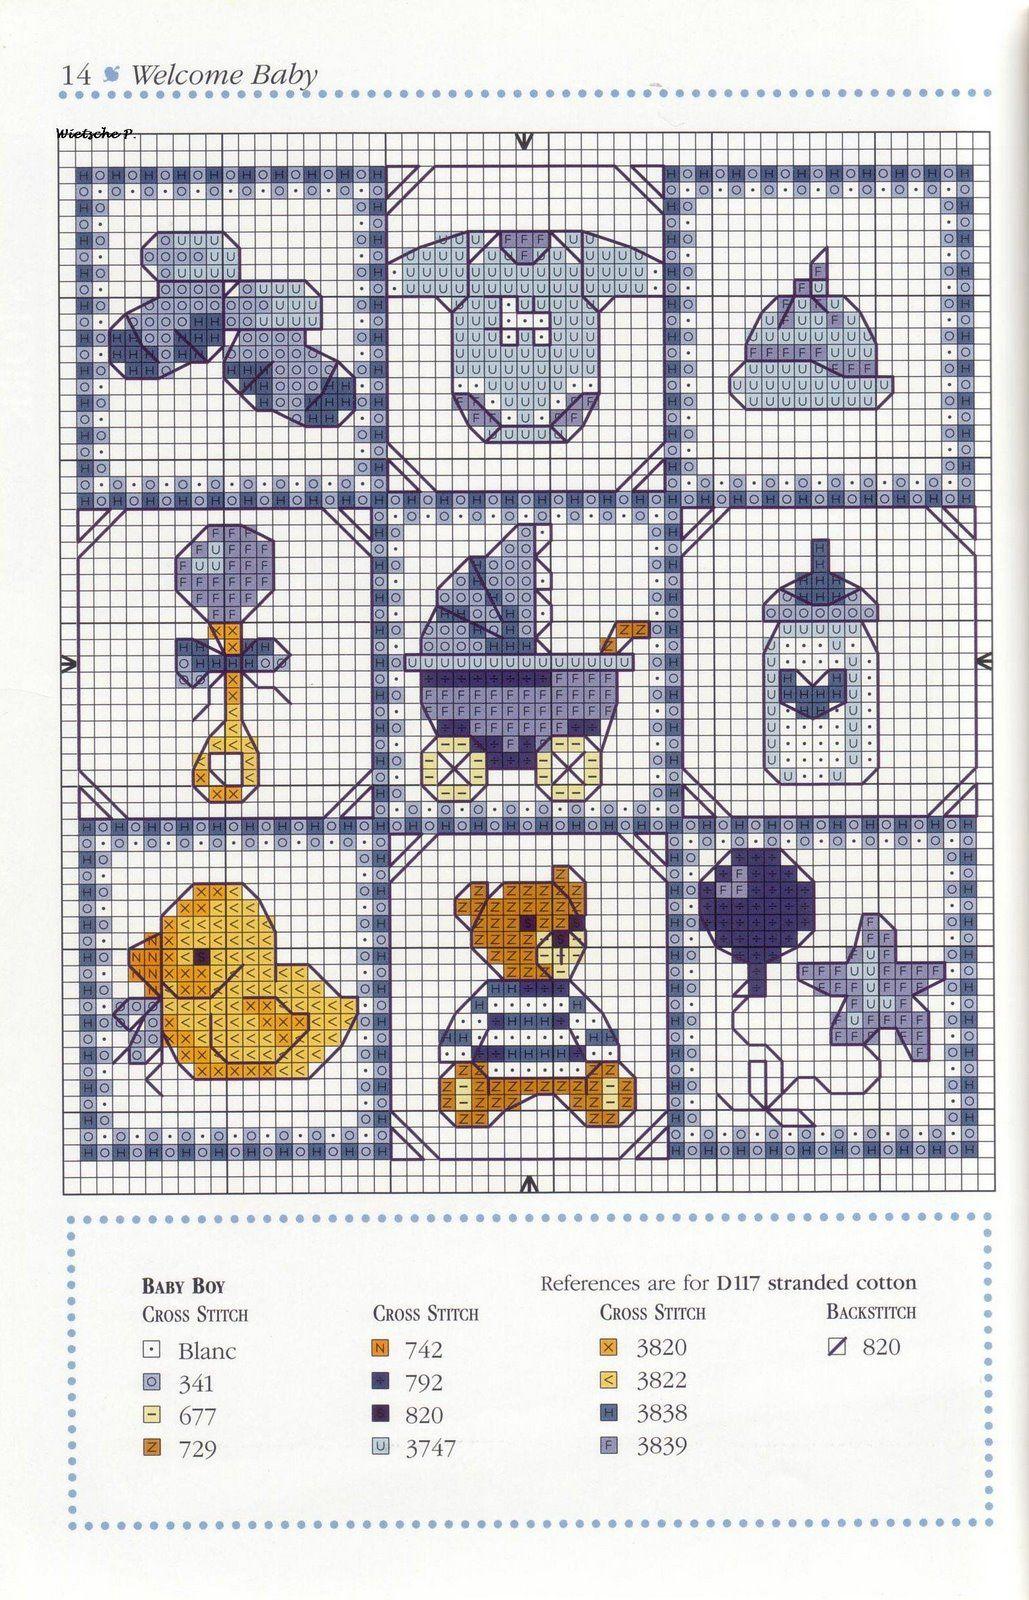 Pin by Inese Liepina on Cross stitch   Pinterest   Punto de cruz ...